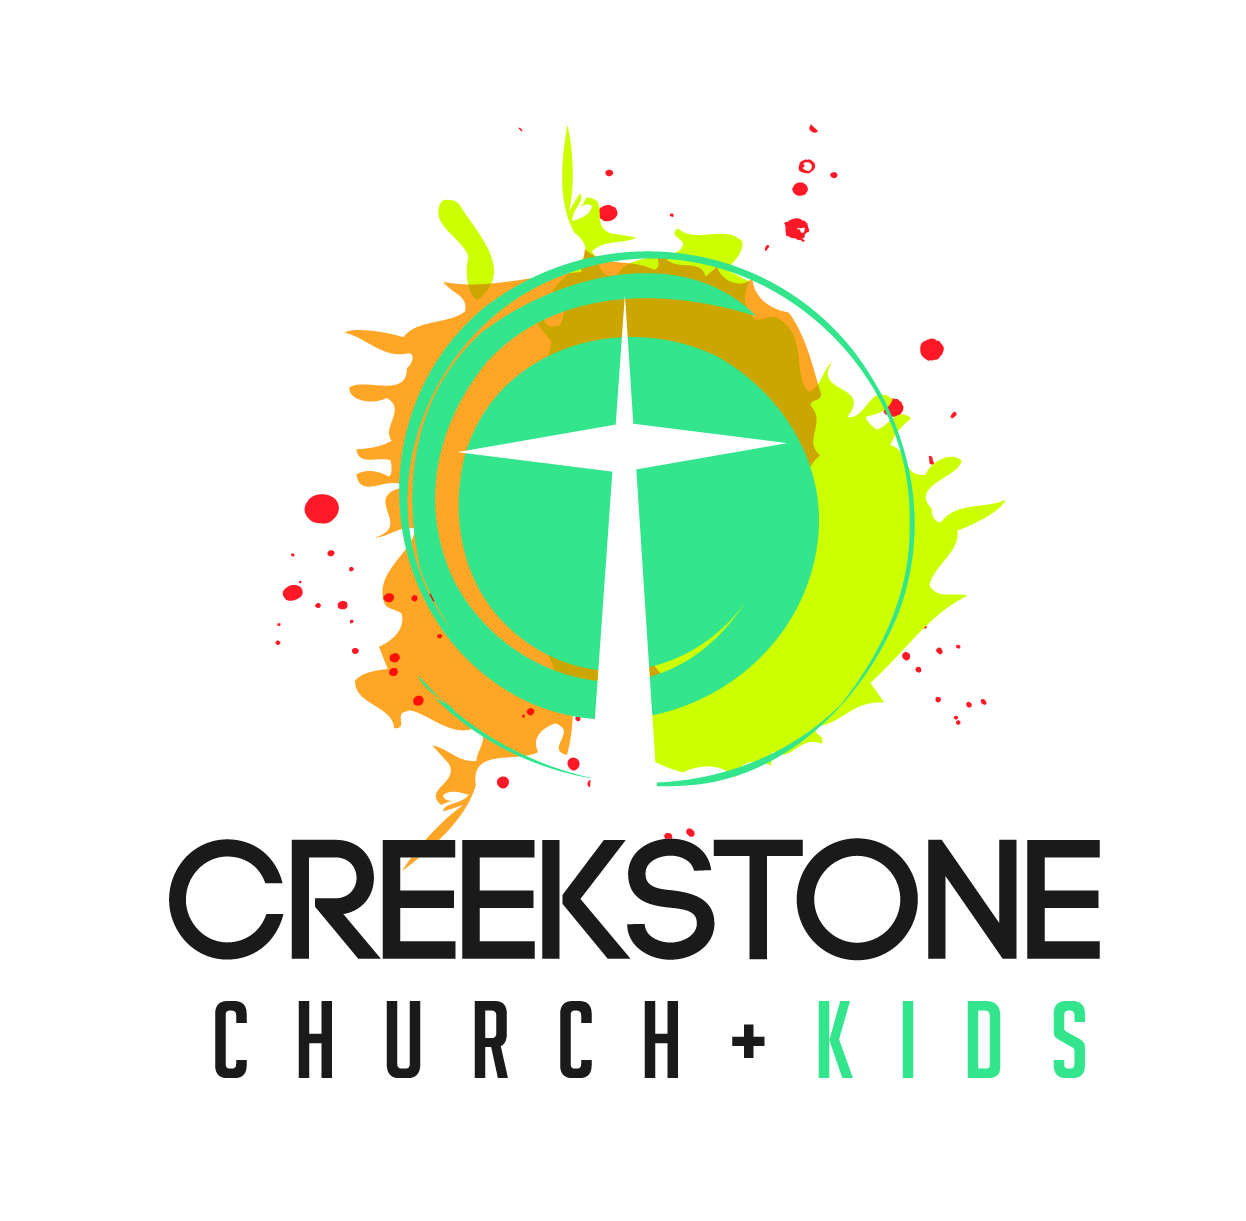 Creekstone_Kids_logo.jpg